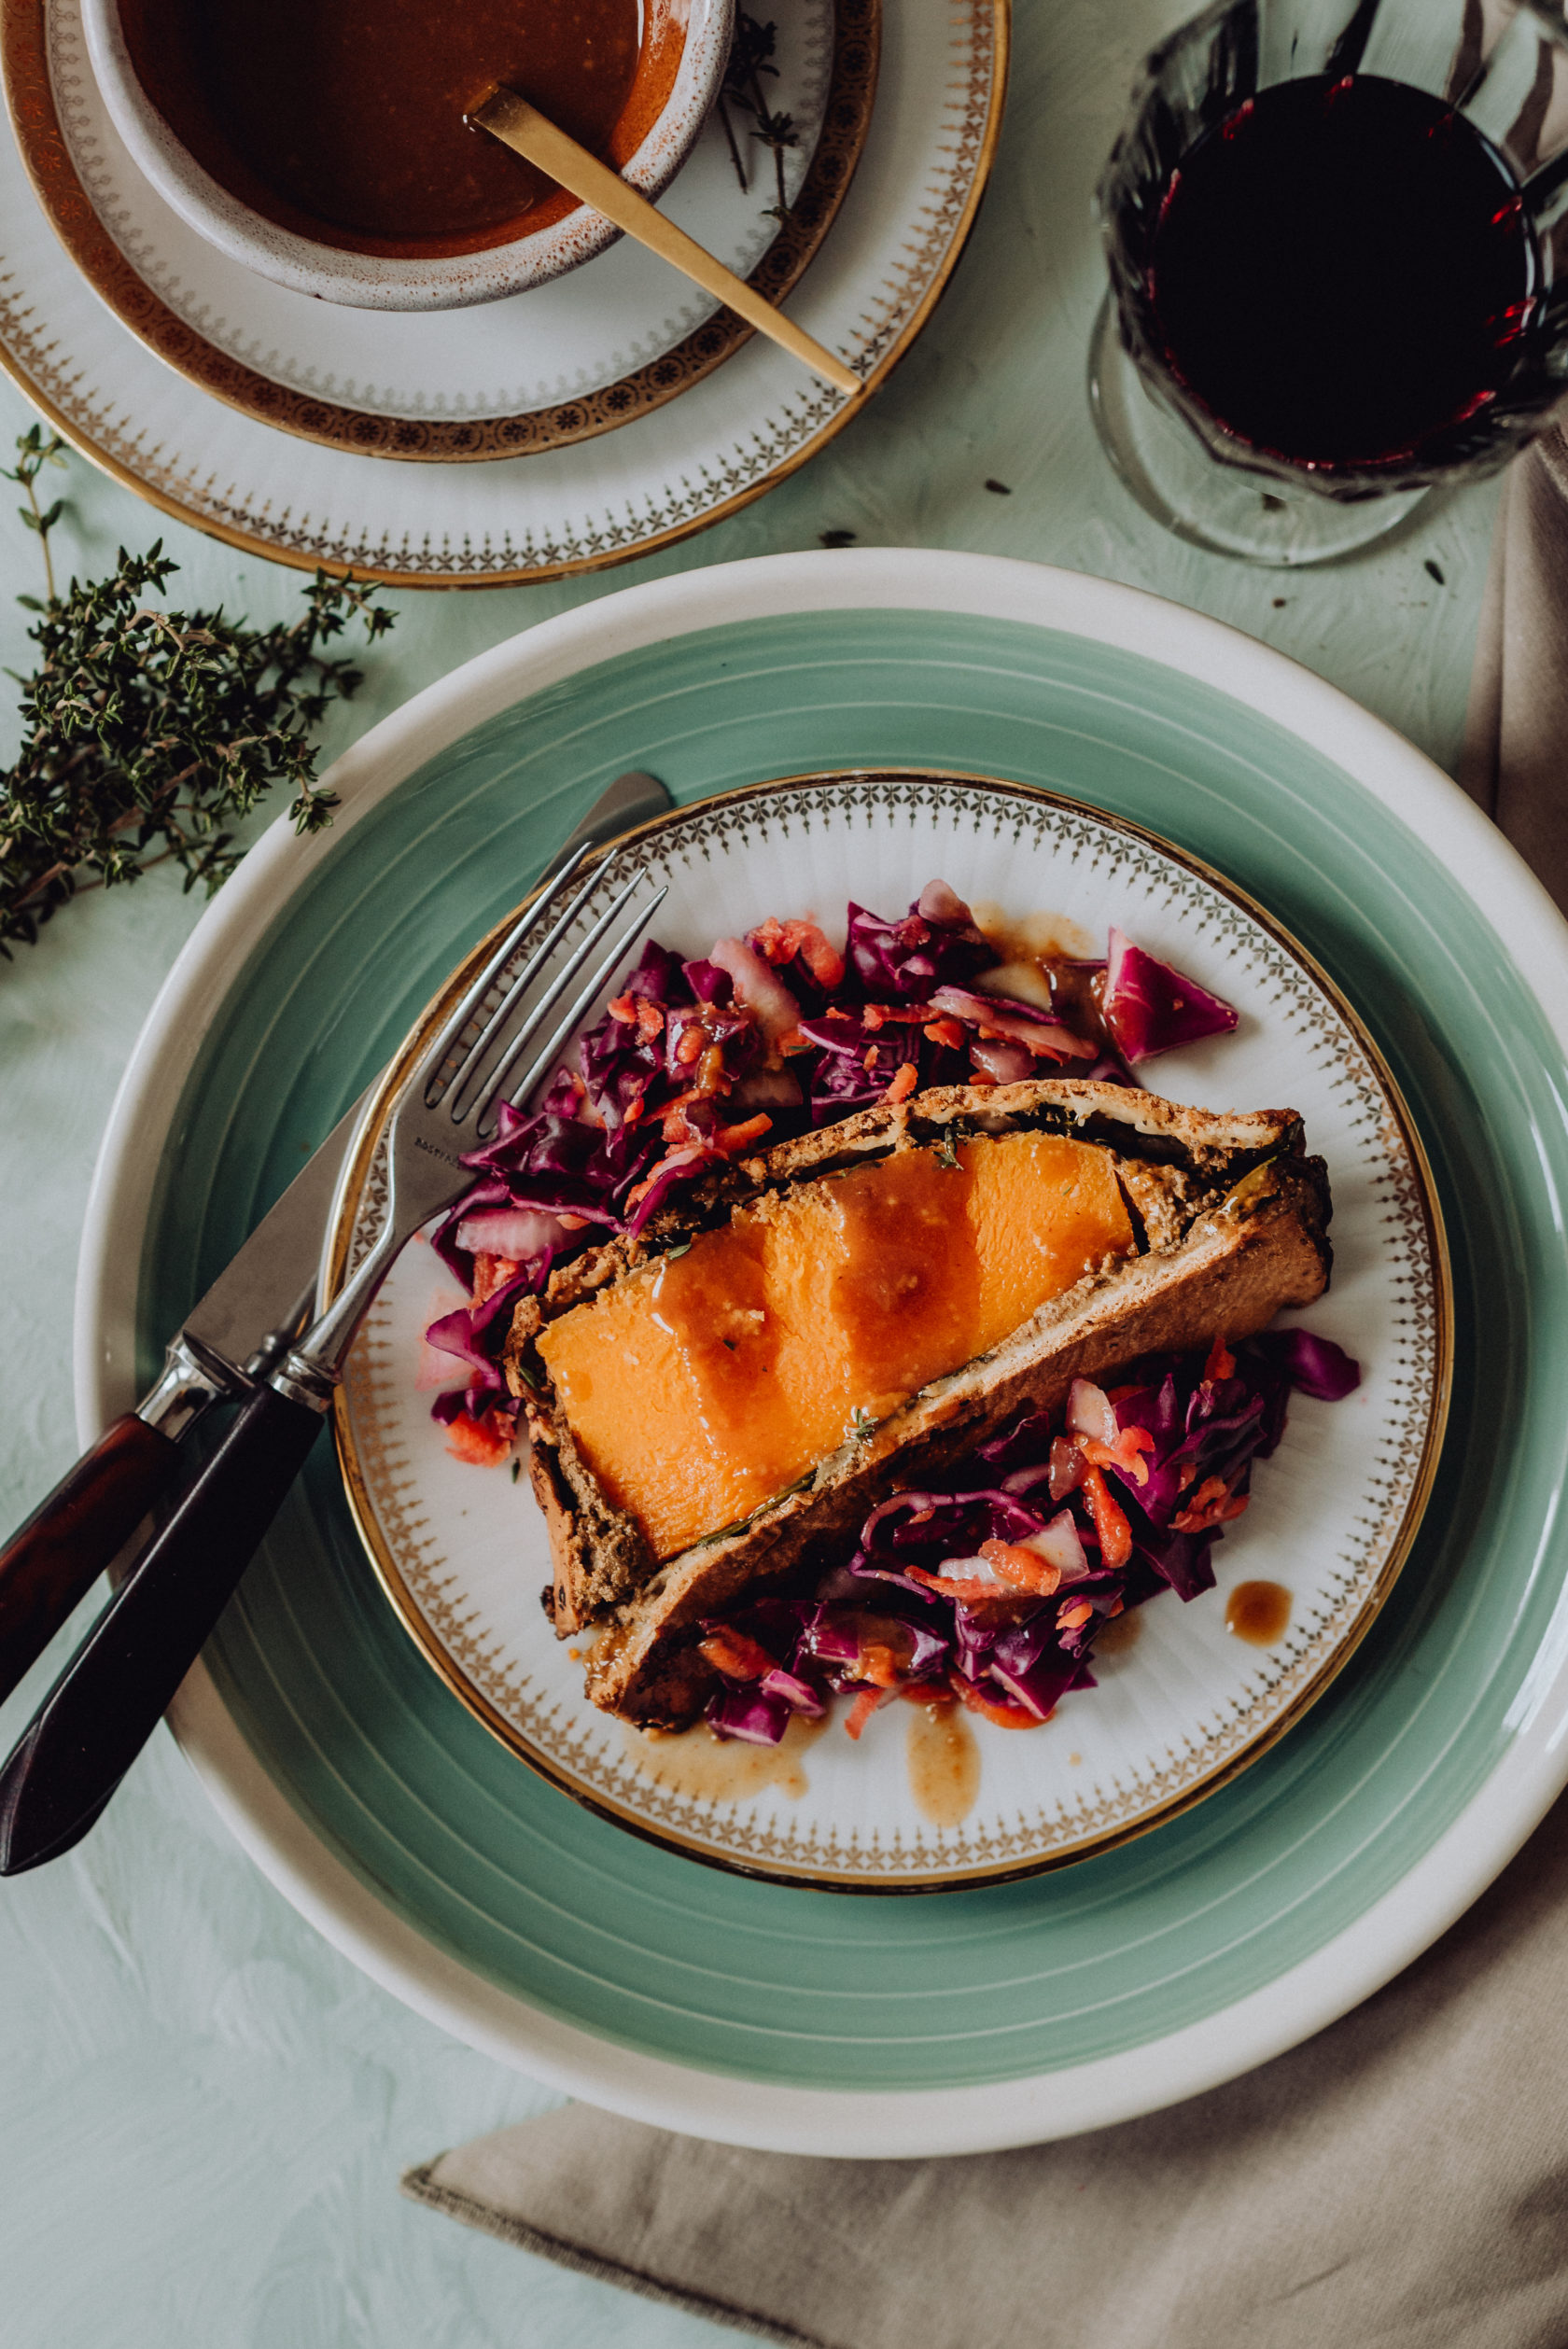 simone-fuerst-fotografie-food-vegan-kuerbisstrudel-weihnachten